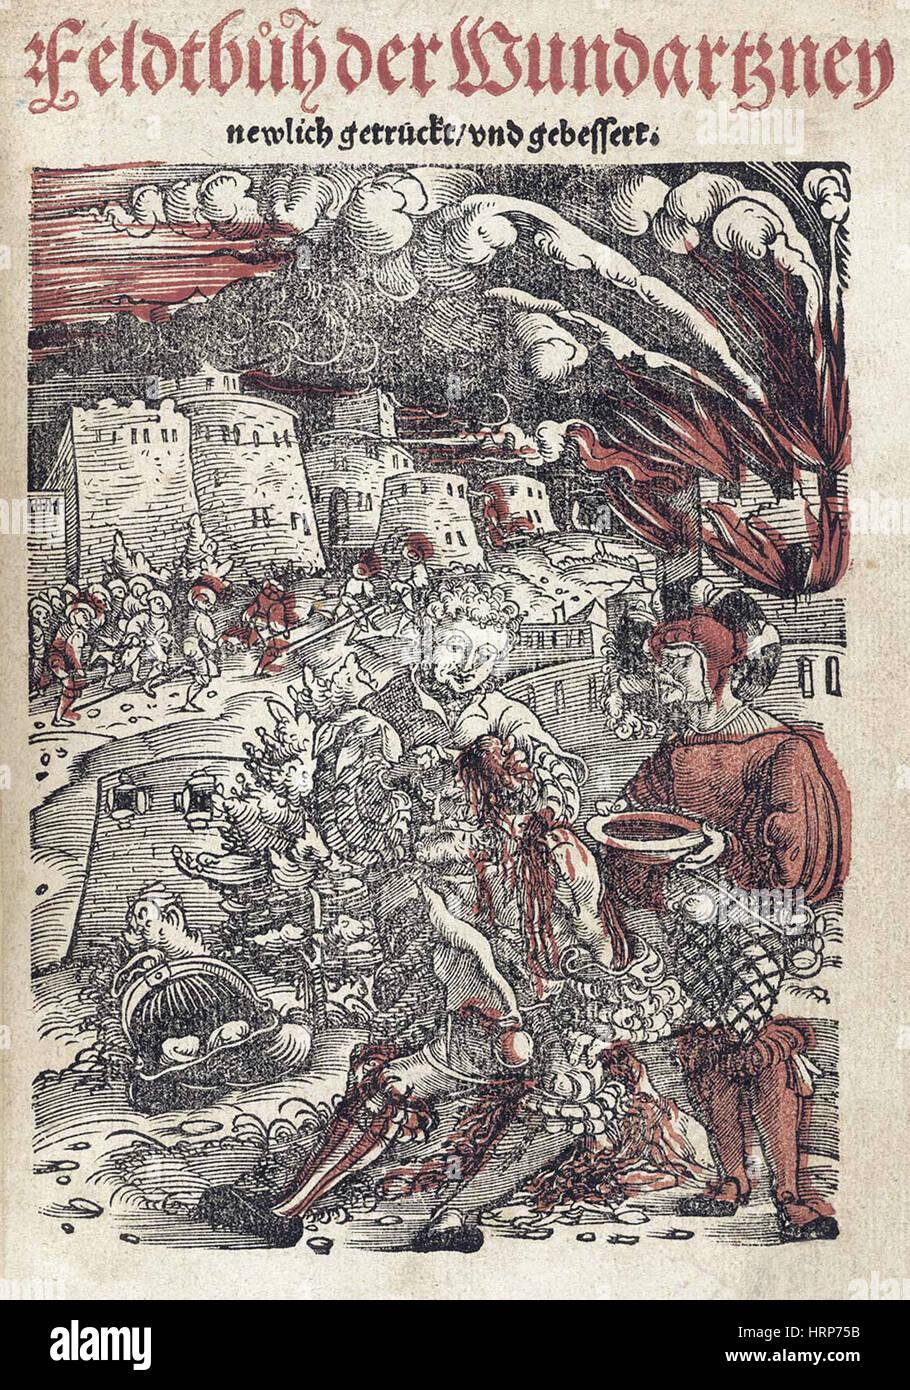 Title Page, 'Feldbuch der Wundartzney', 1528 - Stock Image